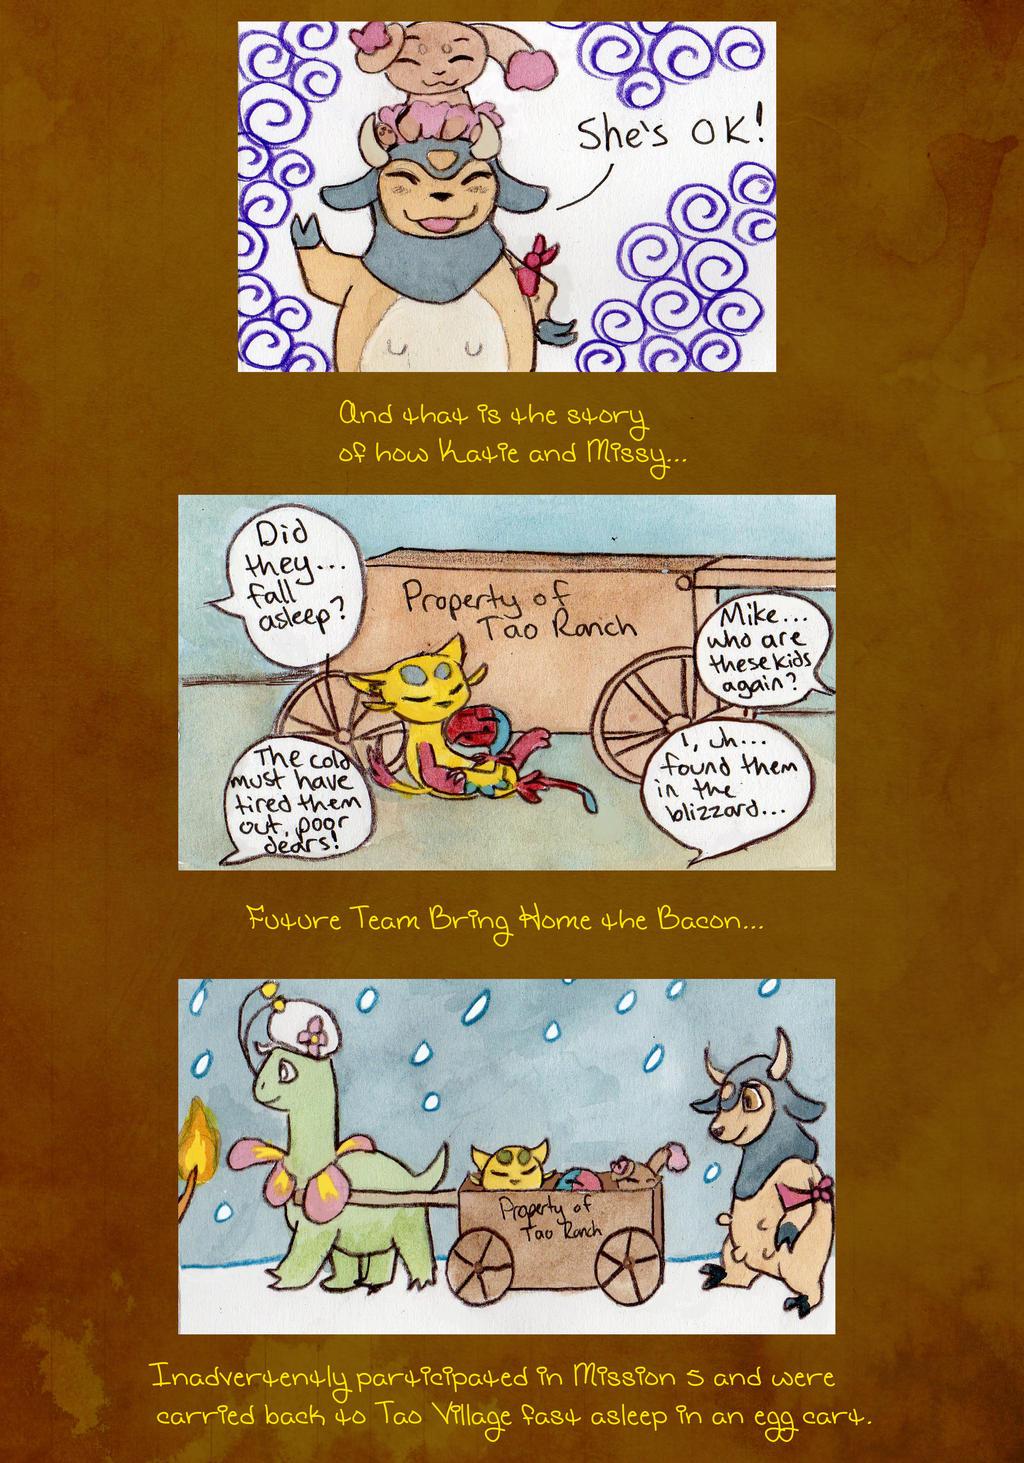 END Mission 5: Page 9, Team BHTB by owlburrow